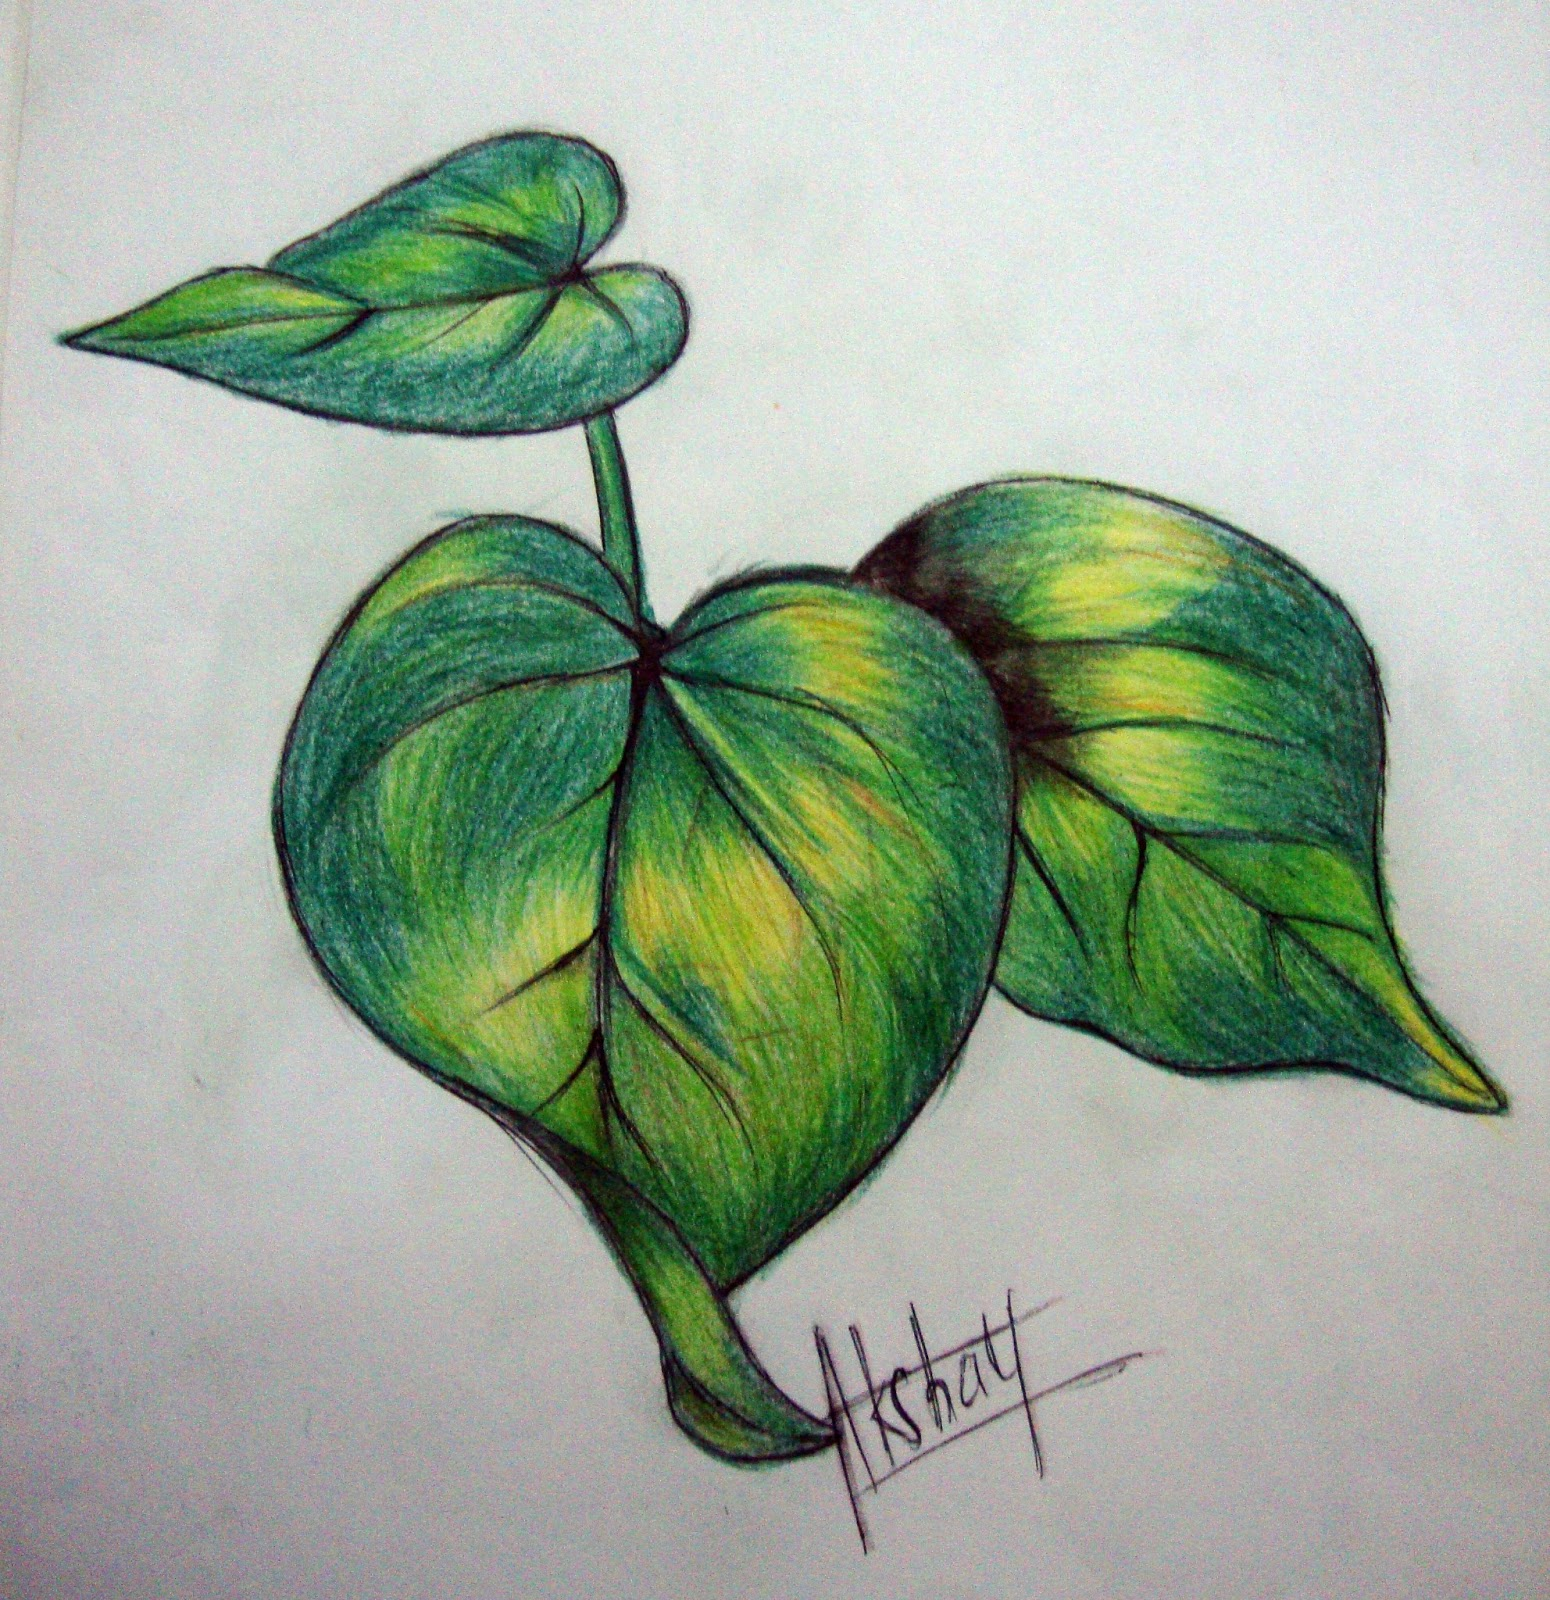 1550x1600 Akshayartcorner Colour Pencil Sketches (Leaf Study)